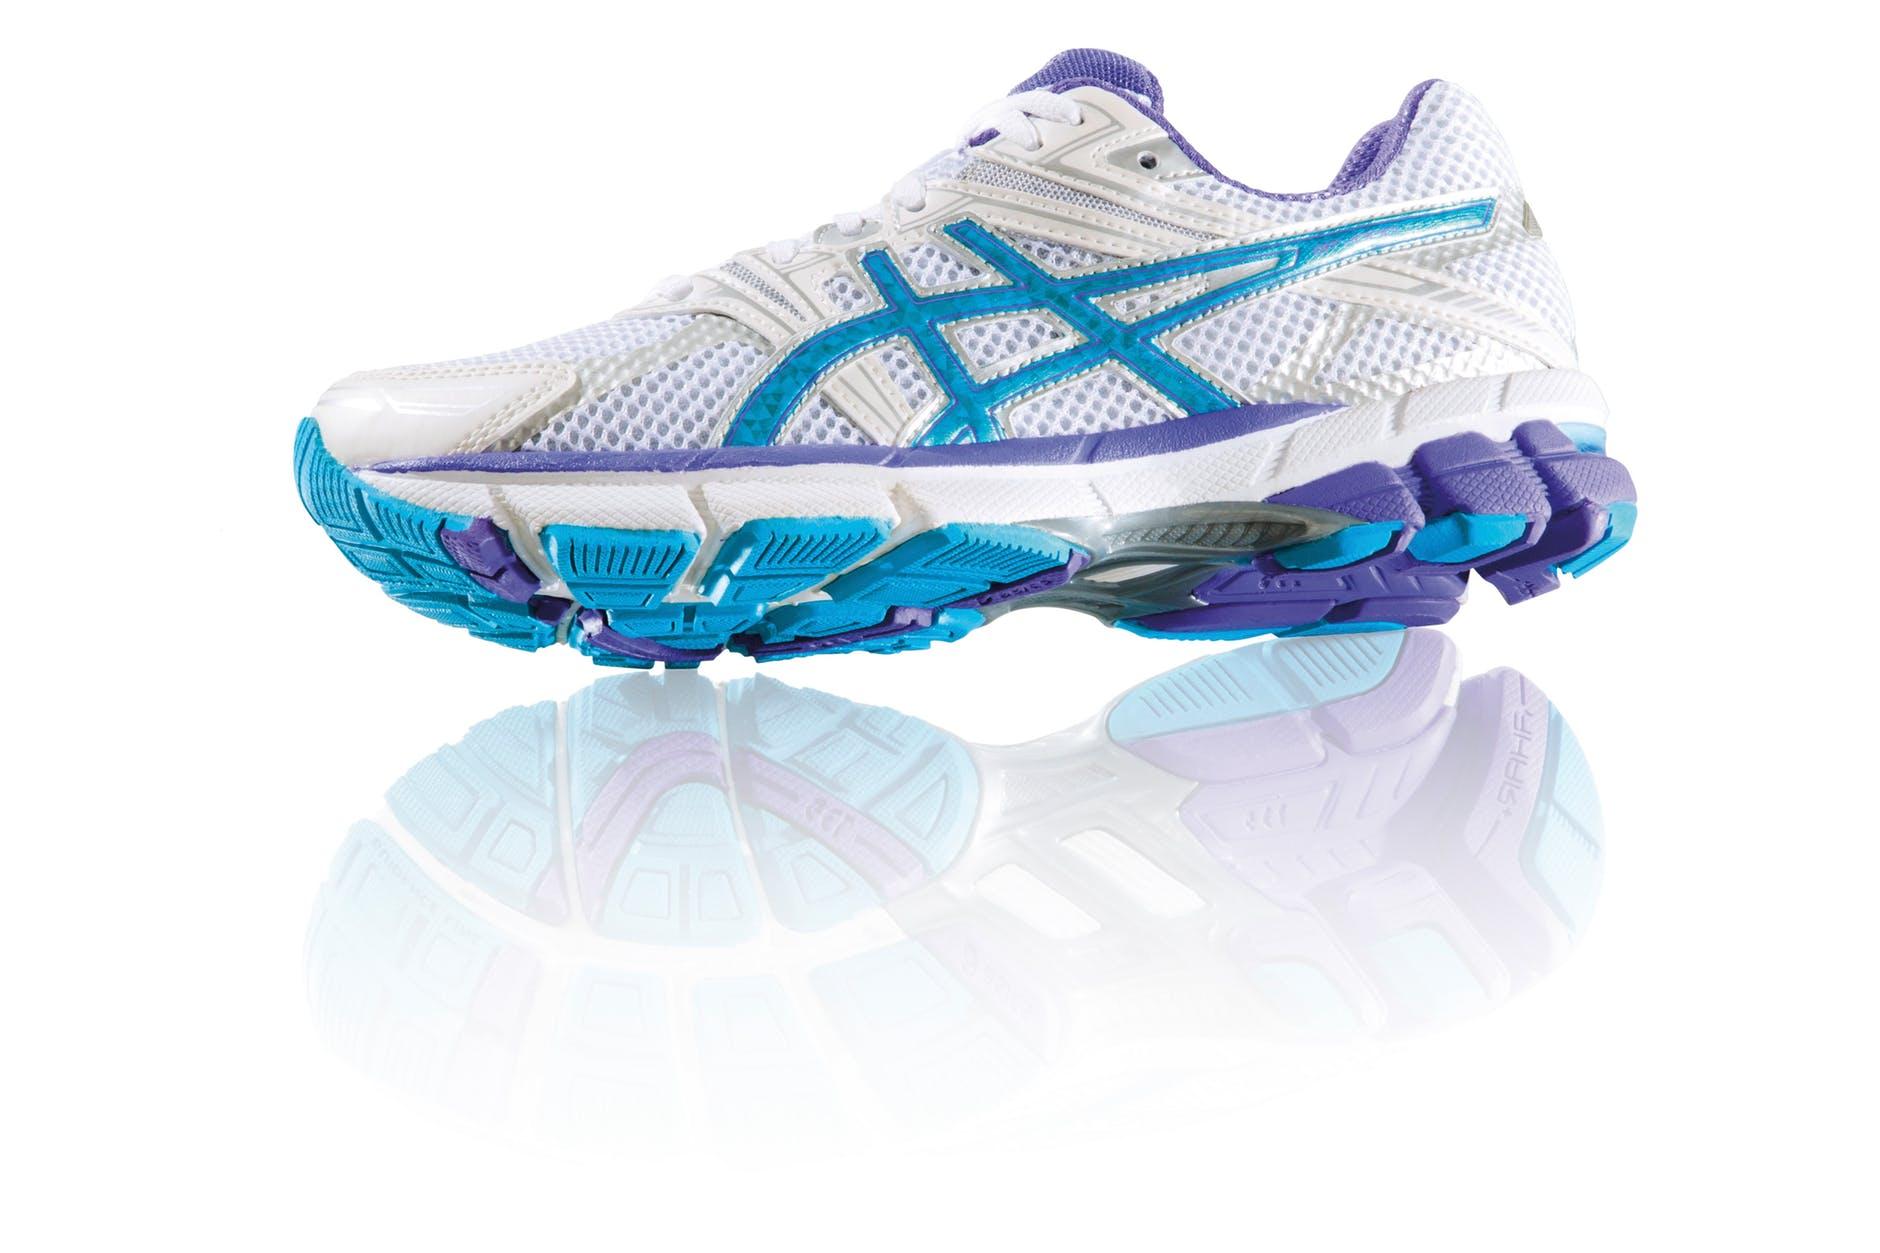 running-shoe-shoe-asics-highly-functional-57421.jpeg